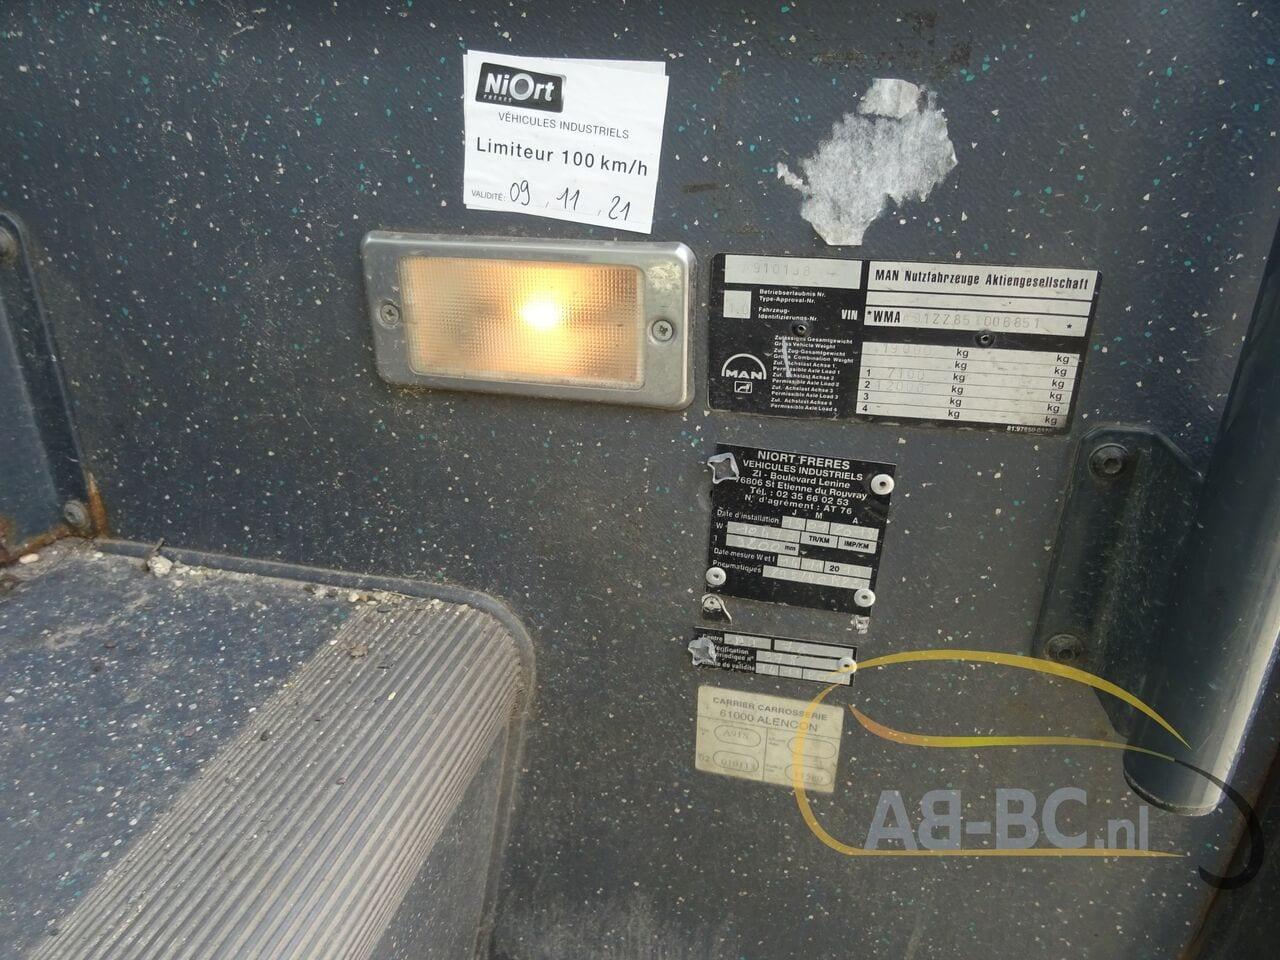 interurban-busMAN-Fast-64-seats---1619619844837535875_big_e4788a34c063b0eeccfe170ee8f7ac40--21042817163019598600